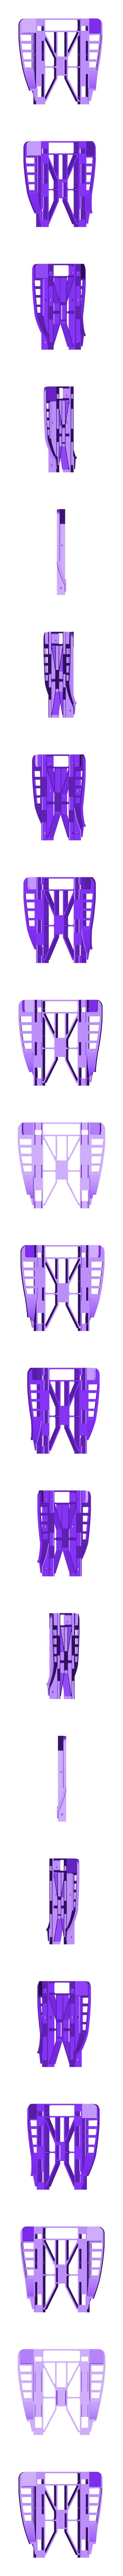 62subfloortrk.stl Download STL file Ratrod Pickup • 3D printing template, macone1